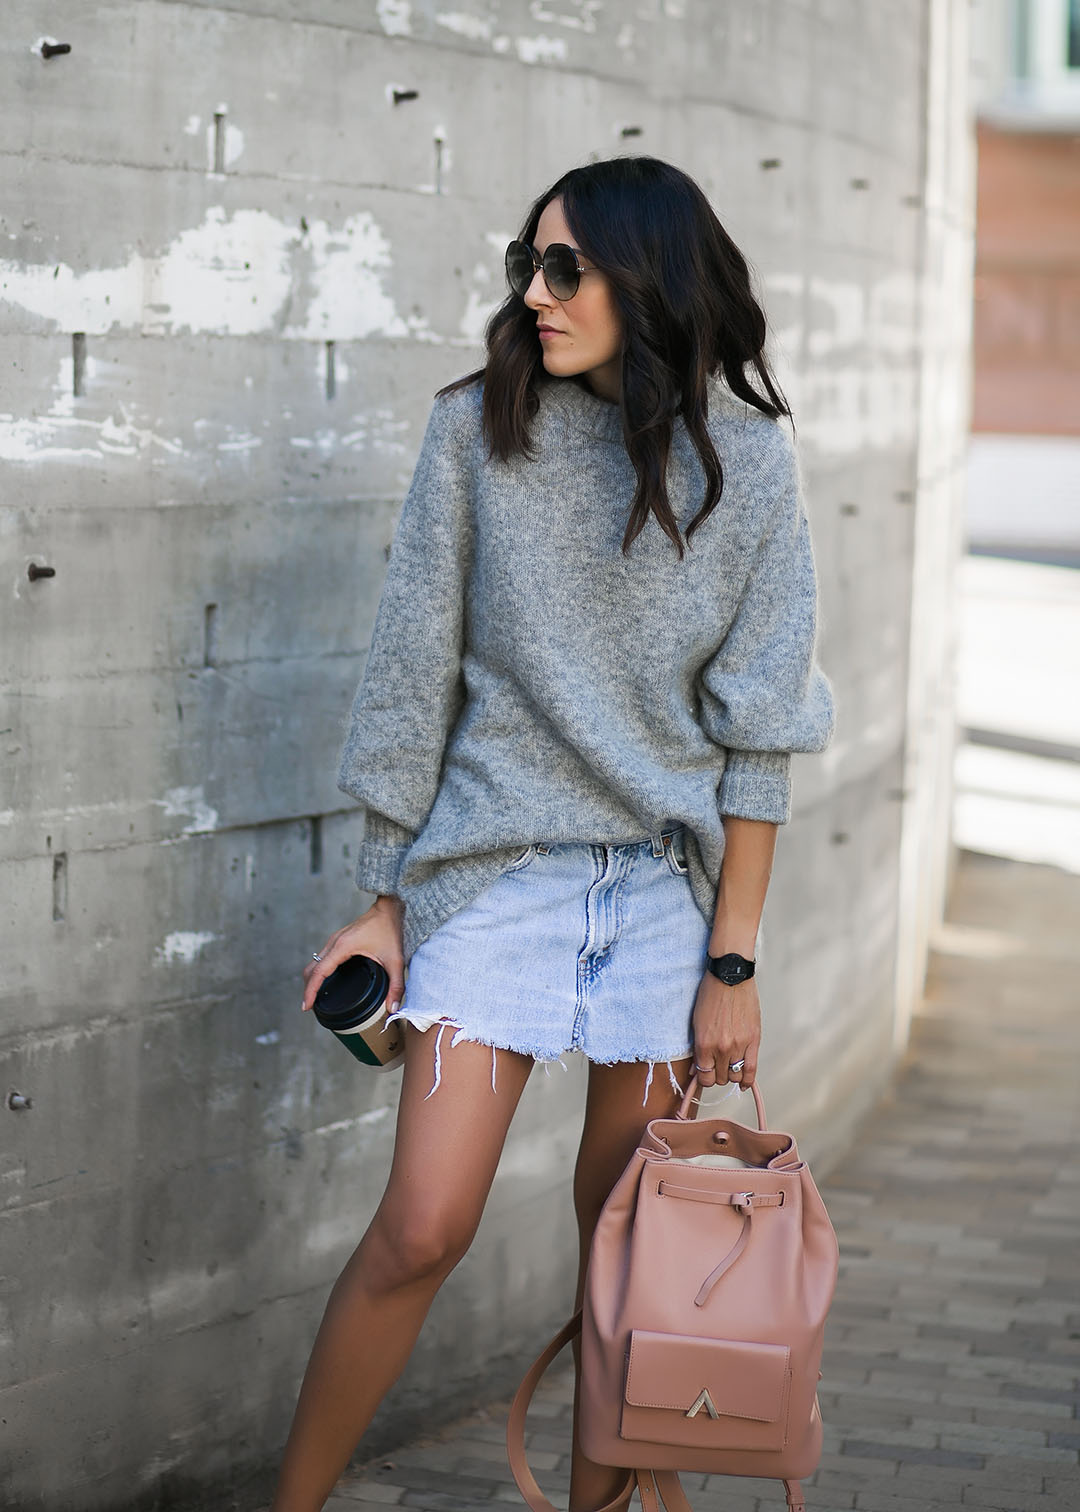 Esemble-Blush-Backpack-Mohair-Sweater.jpg